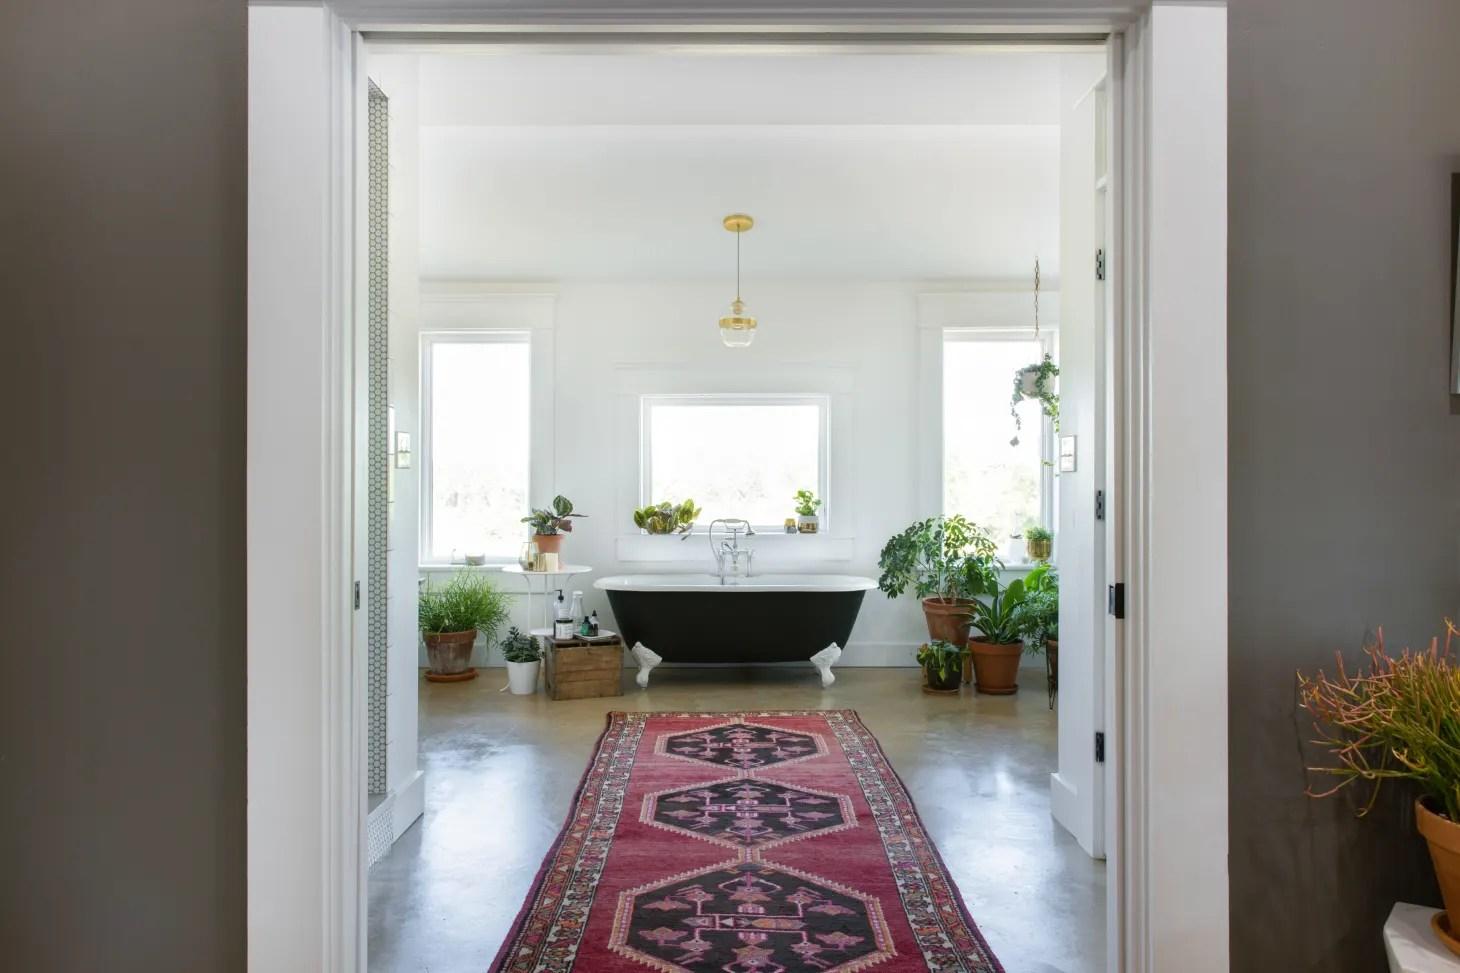 50 Best Bathroom Design Ideas | Apartment Therapy on Apartment Bathroom Ideas  id=64961